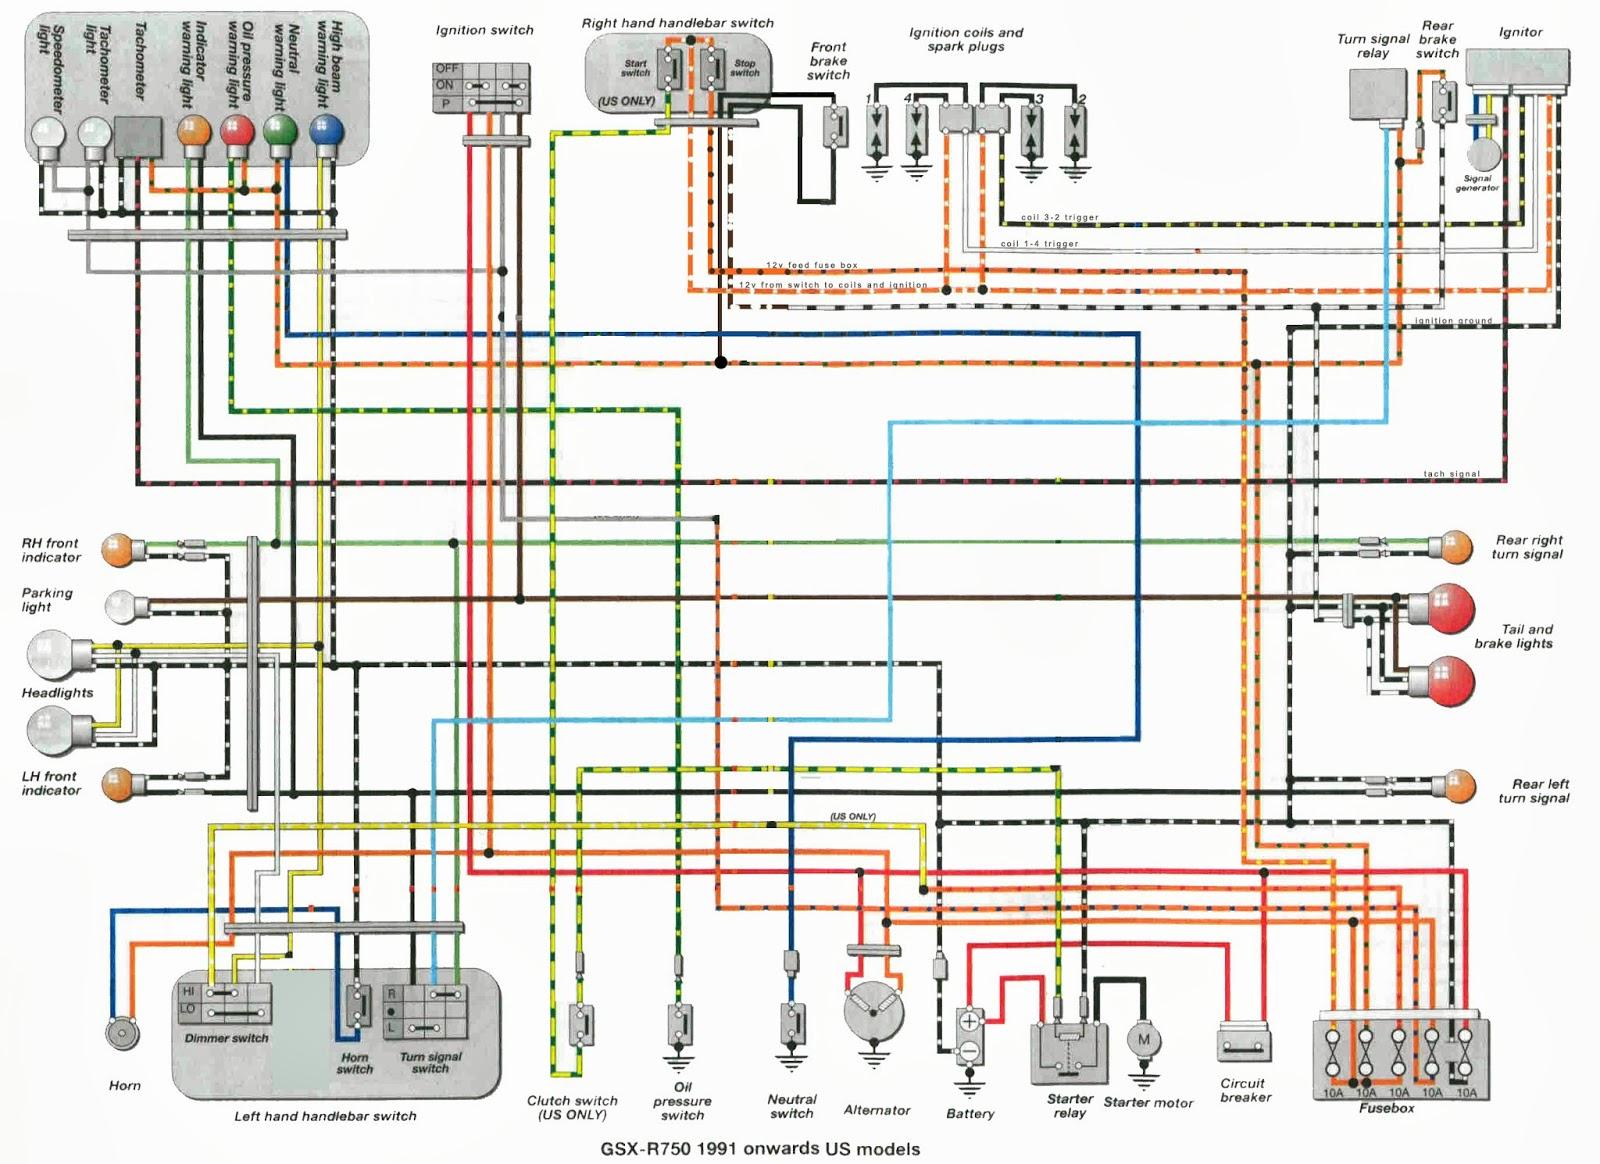 bmw hp4 wiring diagram oh 2386  wiring diagram bmw s1000rr on 2011 bmw s1000rr wiring  oh 2386  wiring diagram bmw s1000rr on